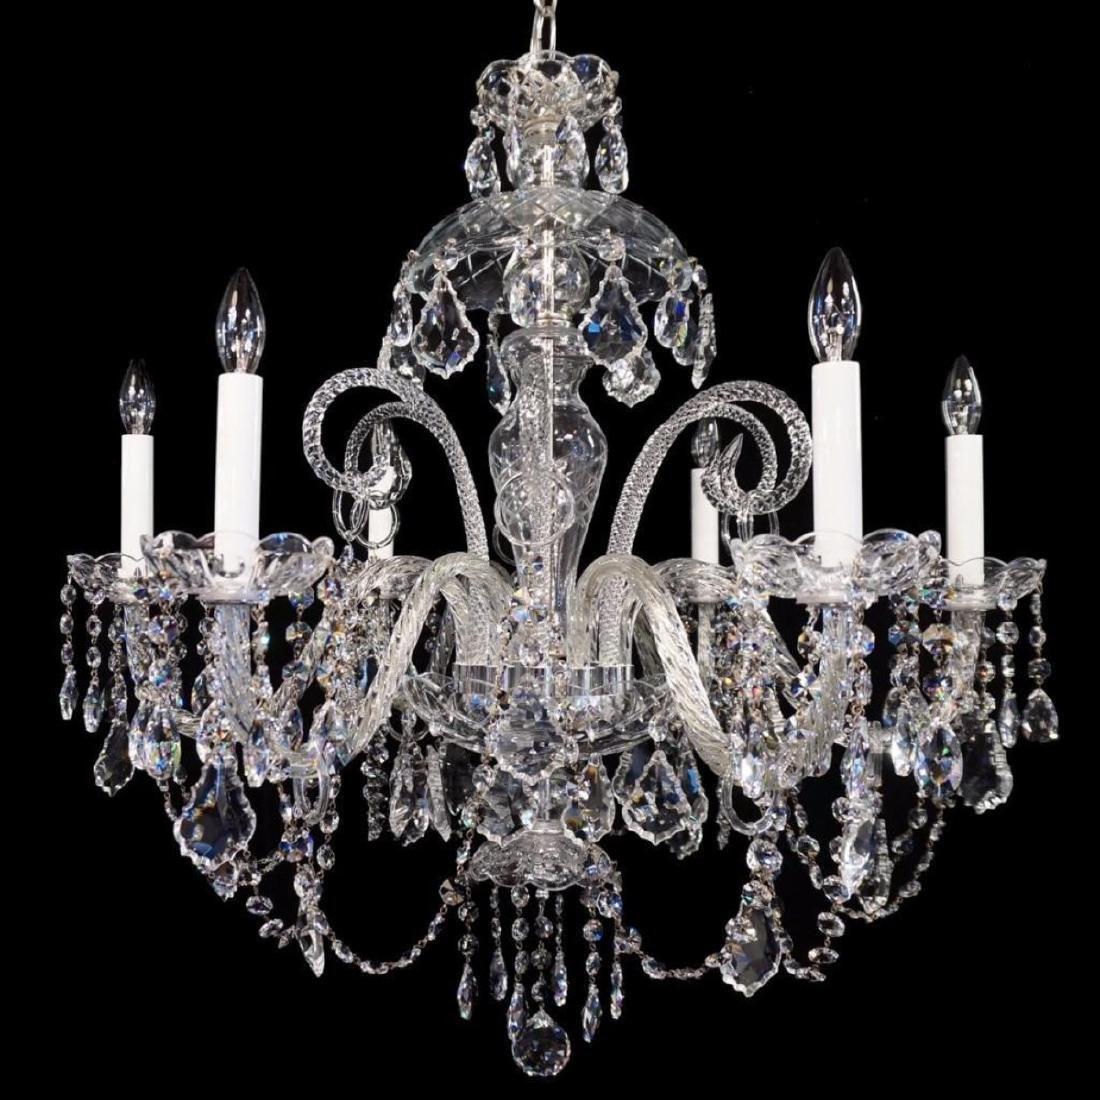 Anadel - 6 Light Crystal Chandelier with Swarovski -